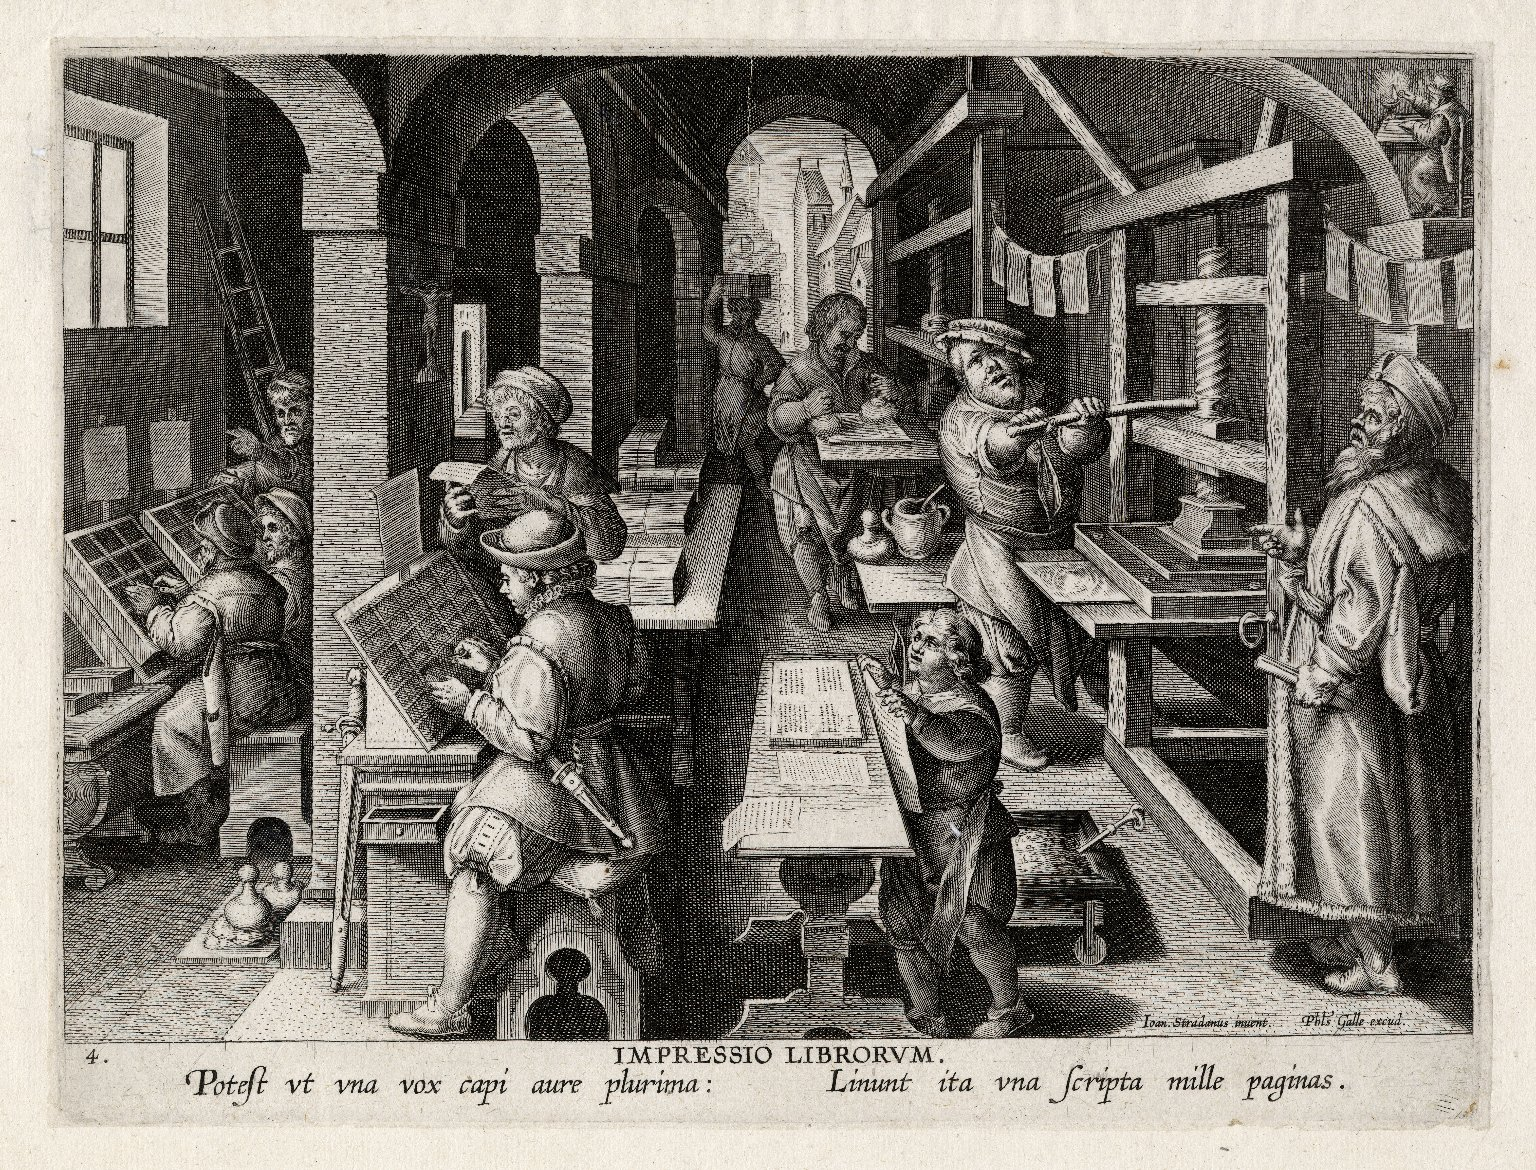 Impressio Librorum, plate 4 of Nova Reperta